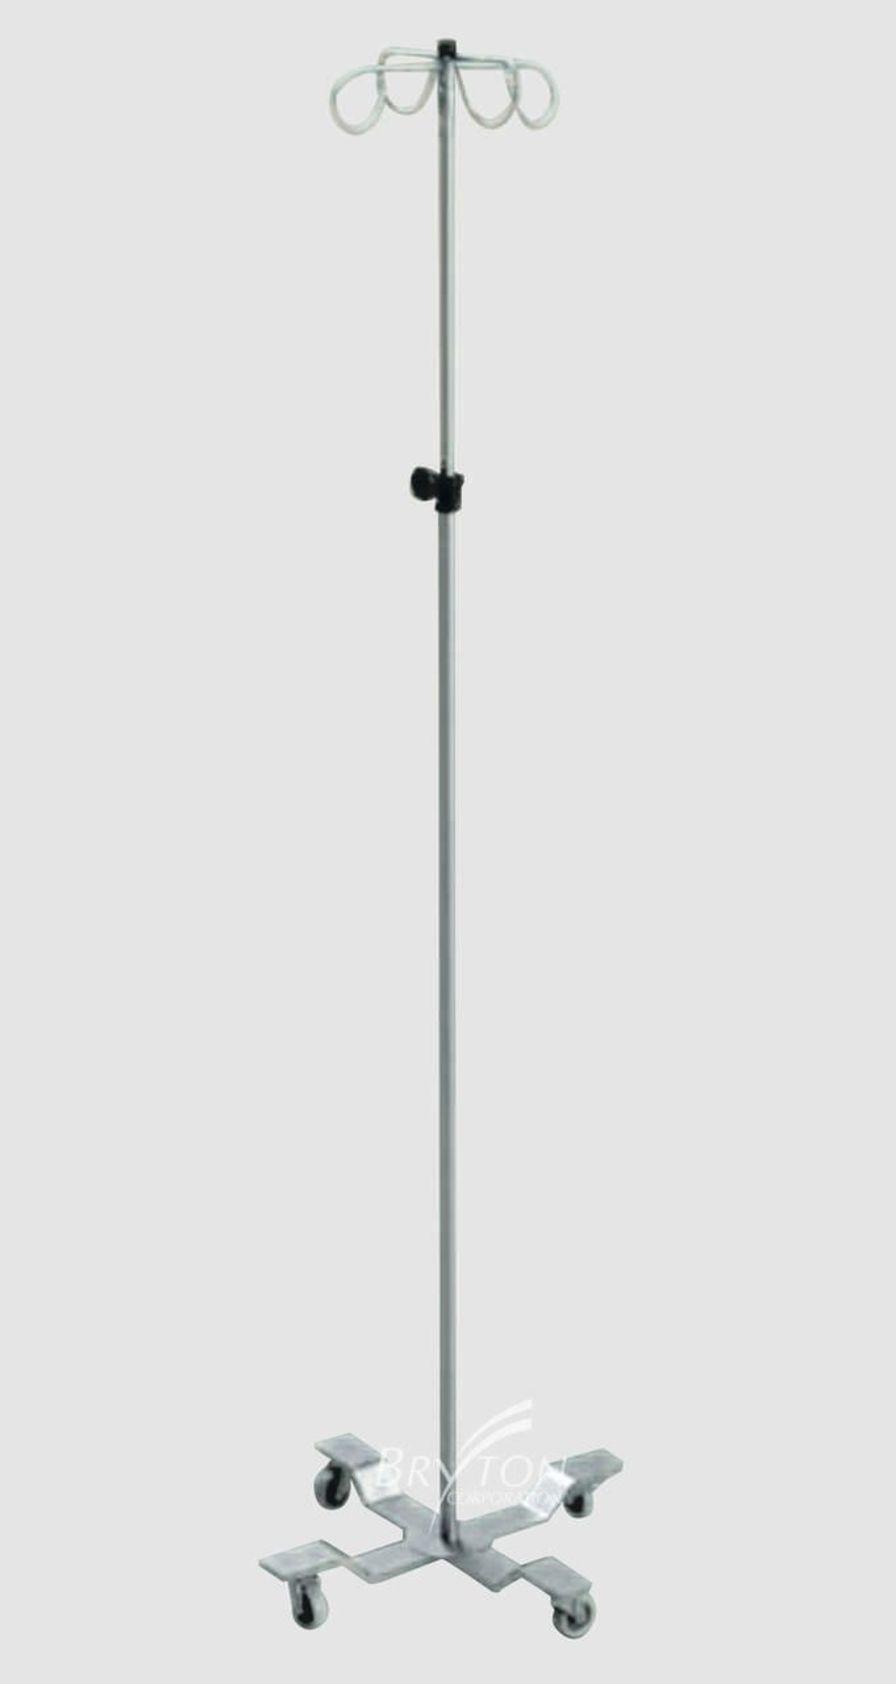 4-hook IV pole / telescopic / on casters IVP-7240 BRYTON CORPORATION